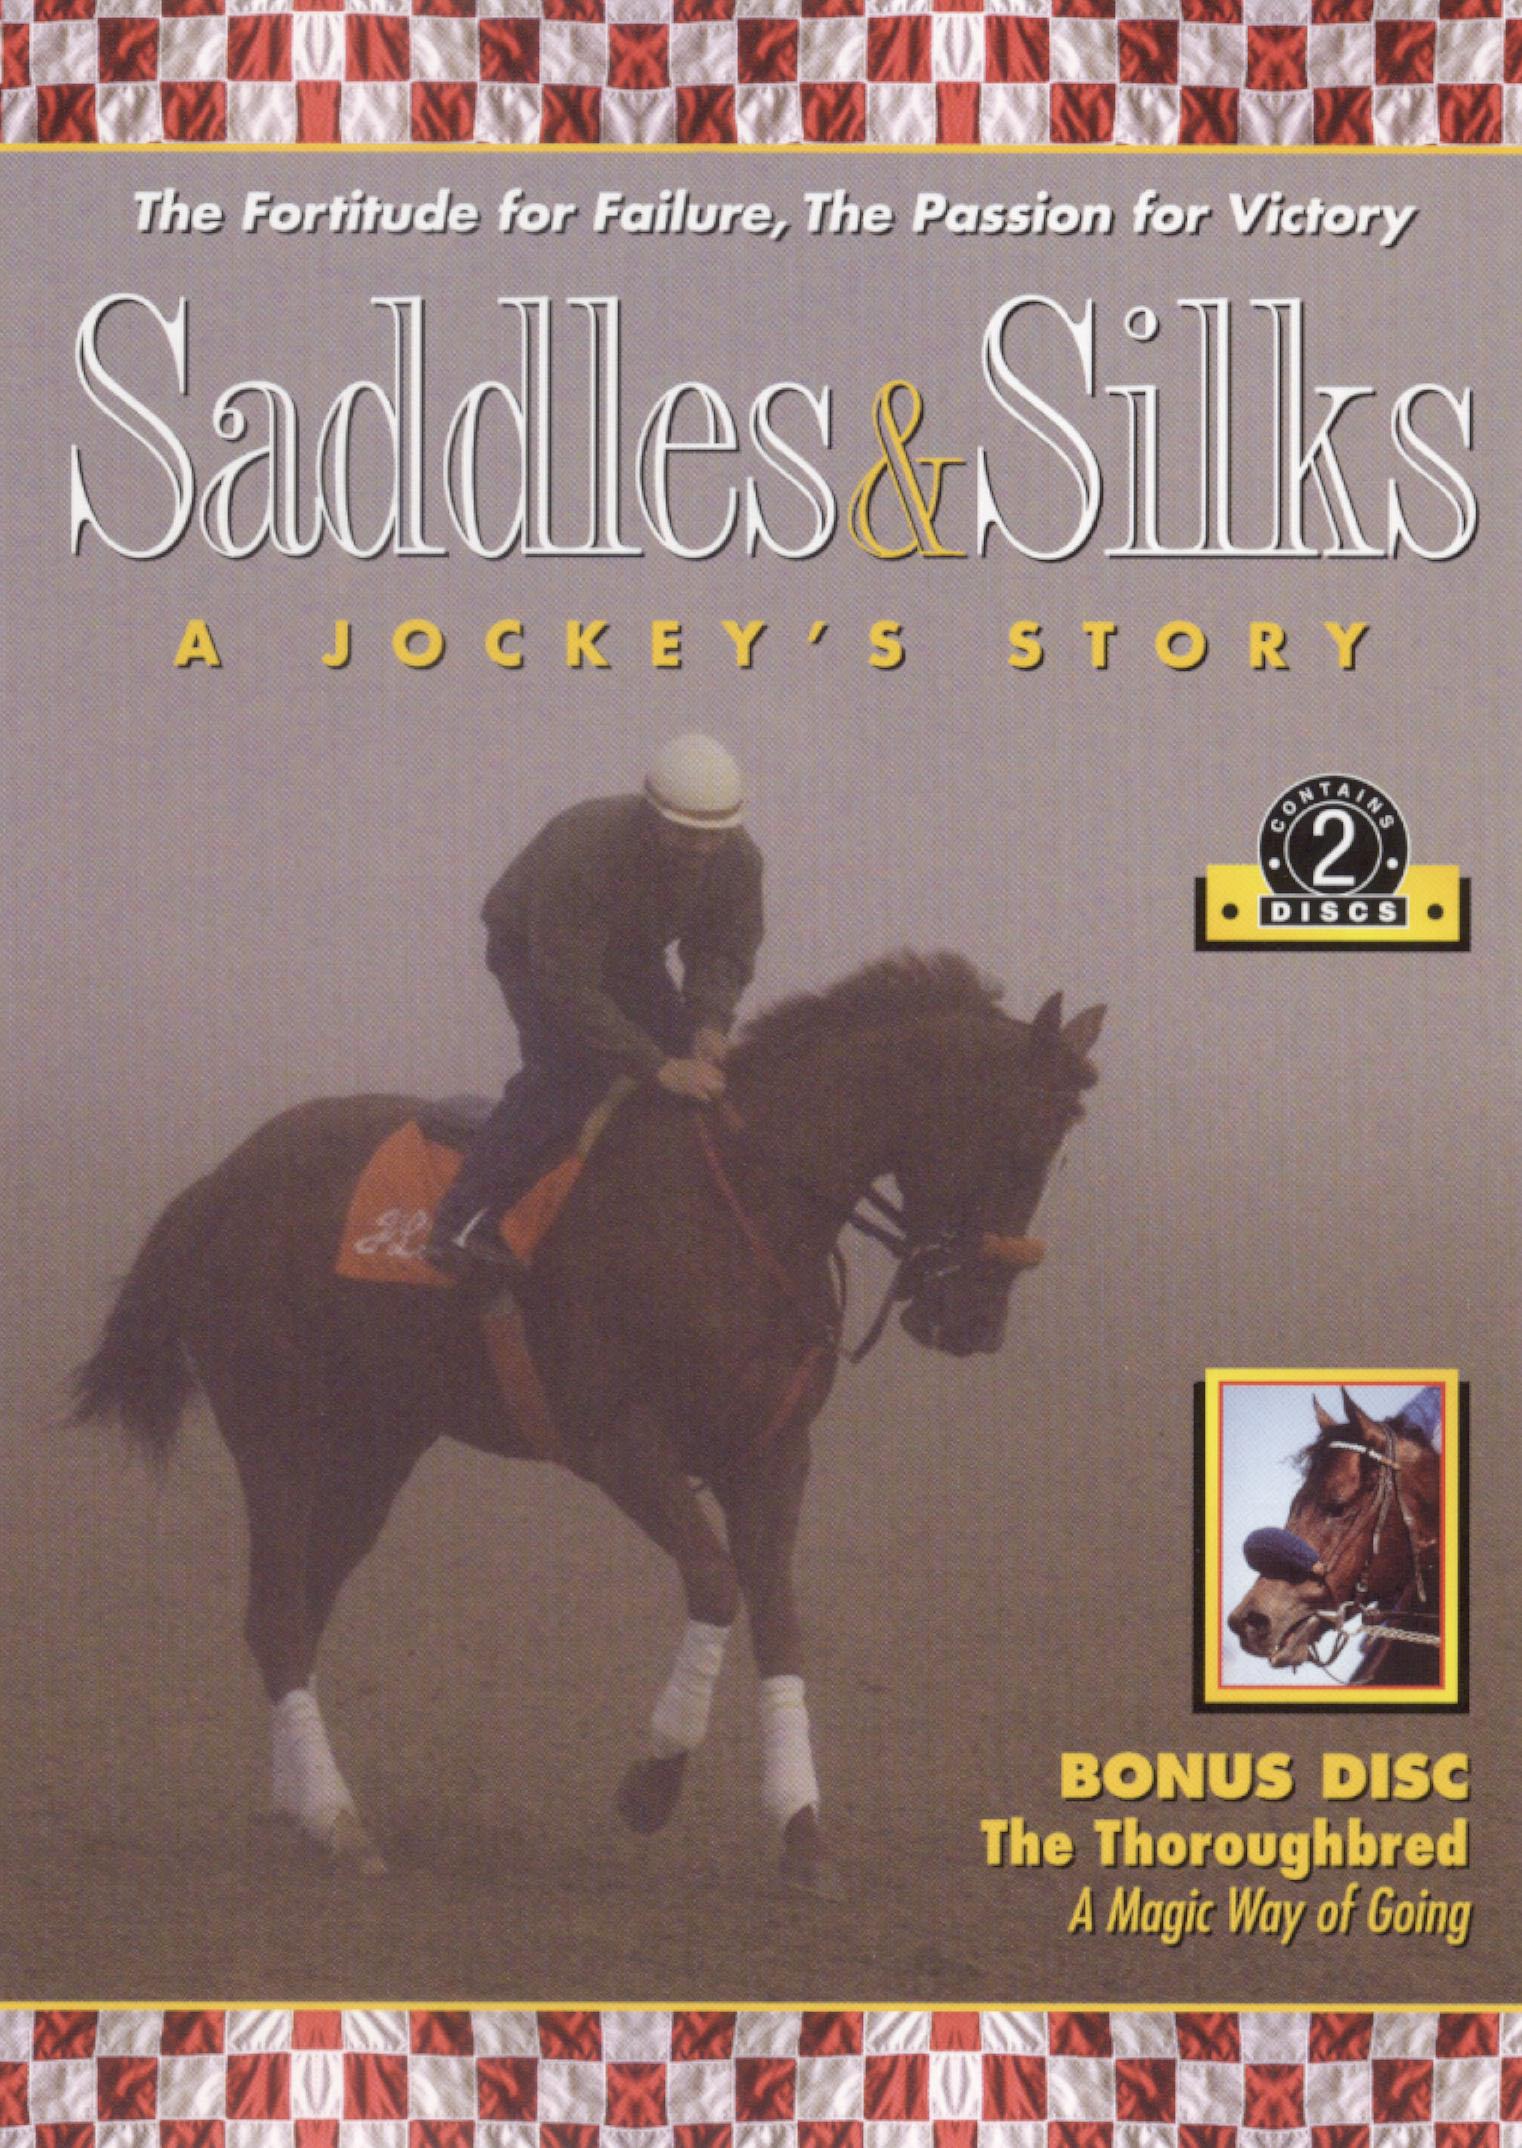 Saddles and Silks: A Jockey's Story